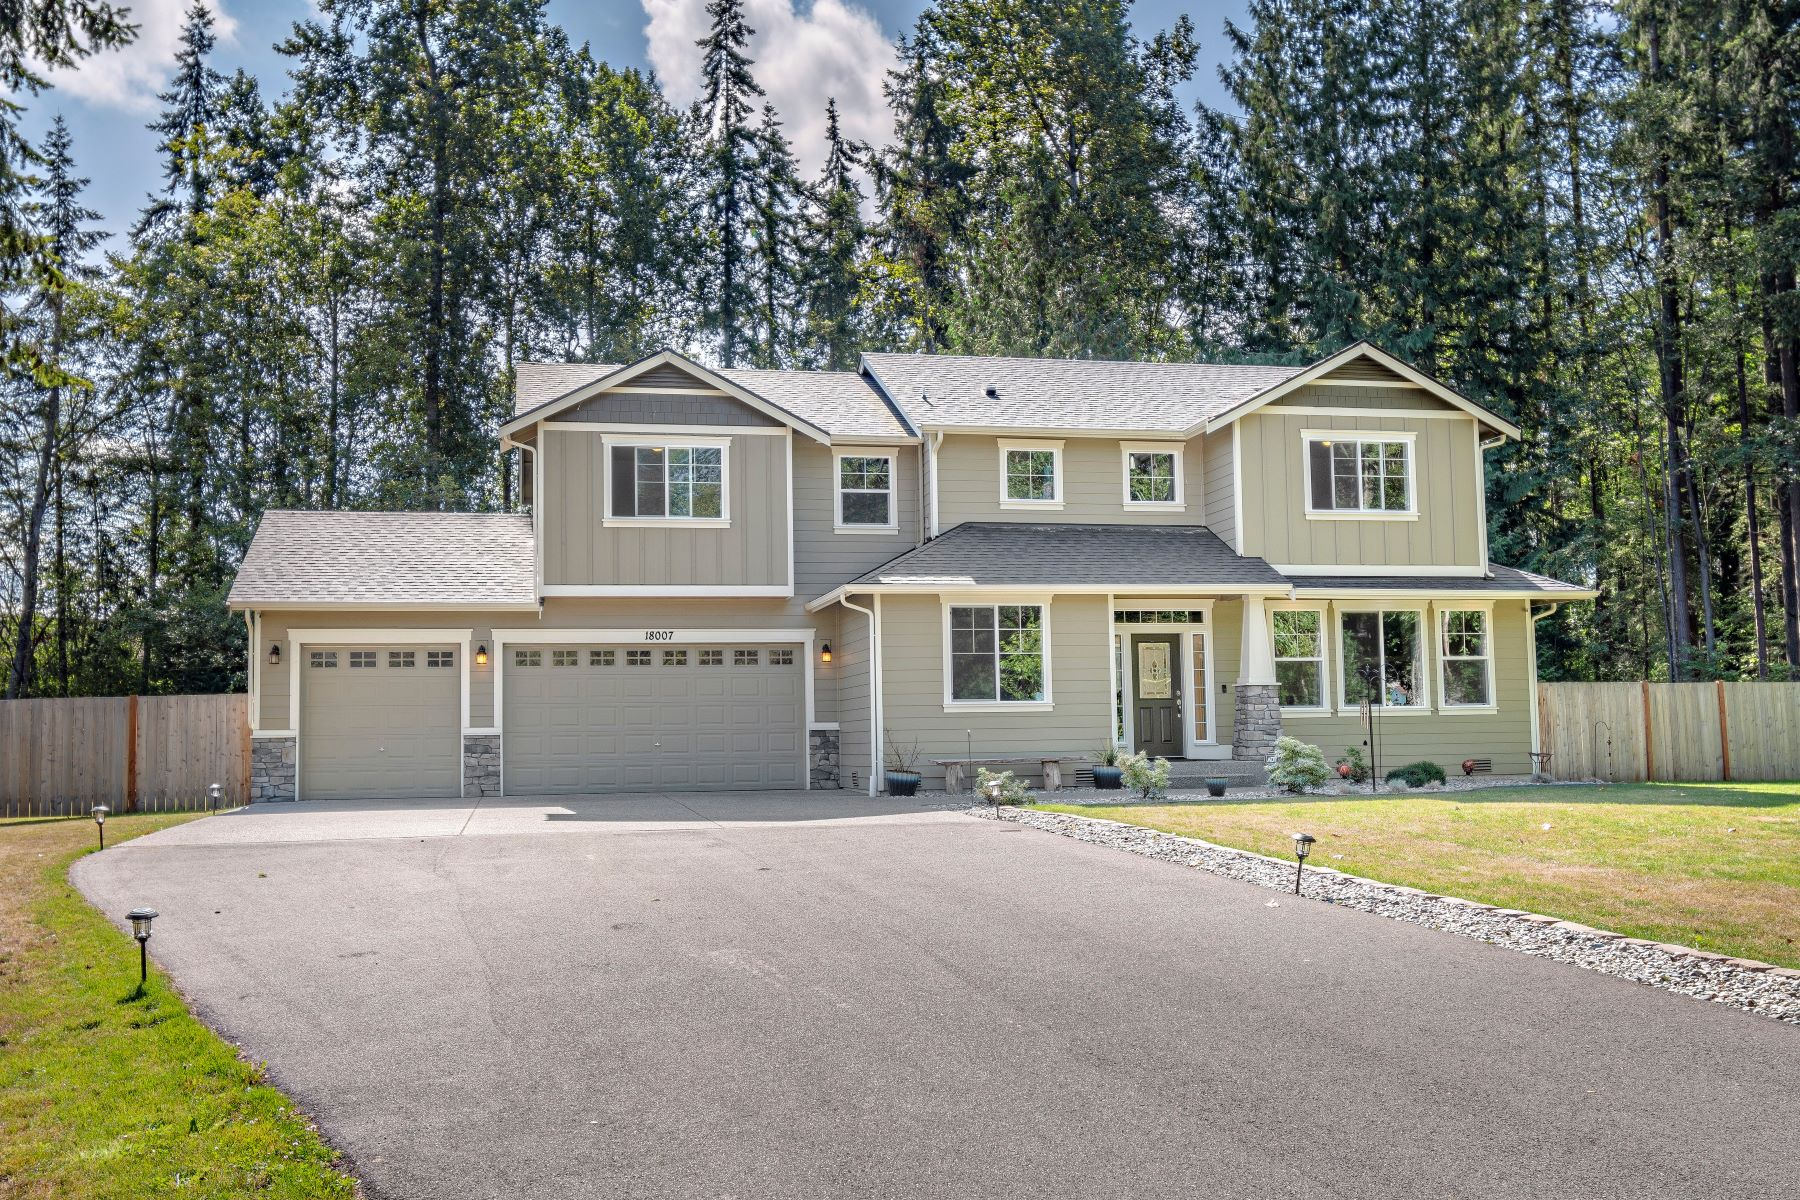 Single Family Homes for Sale at Smokey Point 18007 25th Ave NE Marysville, Washington 98271 United States